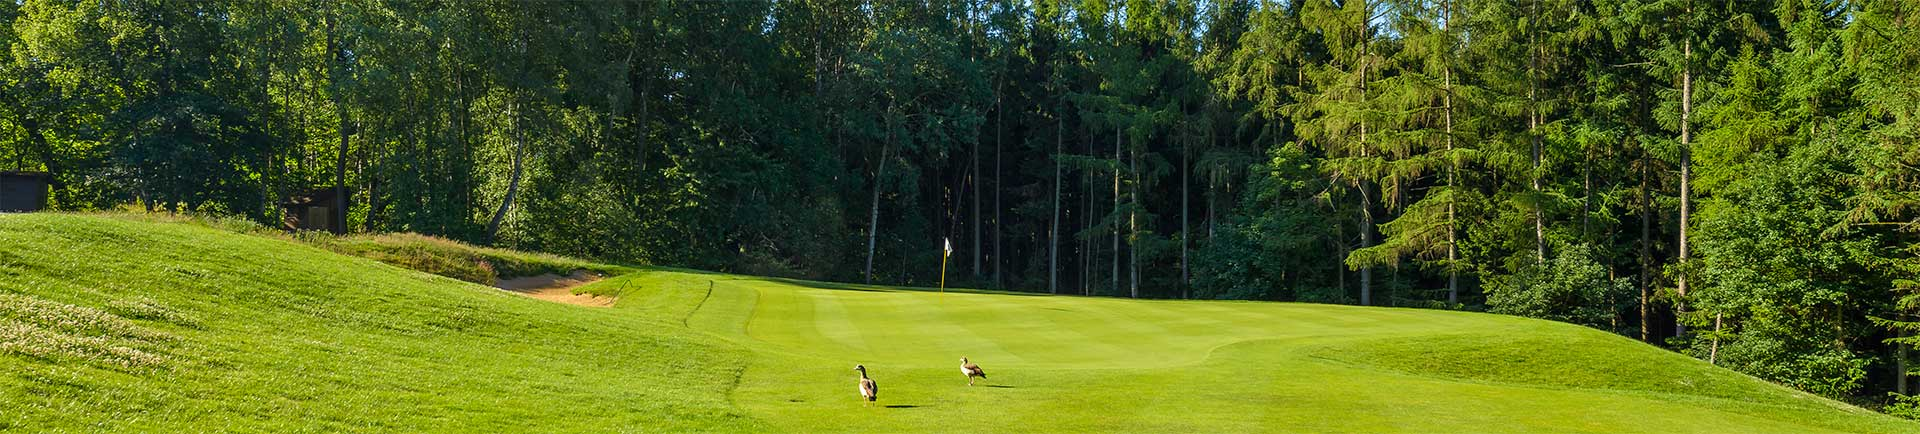 rheinblick-golfcourse-17